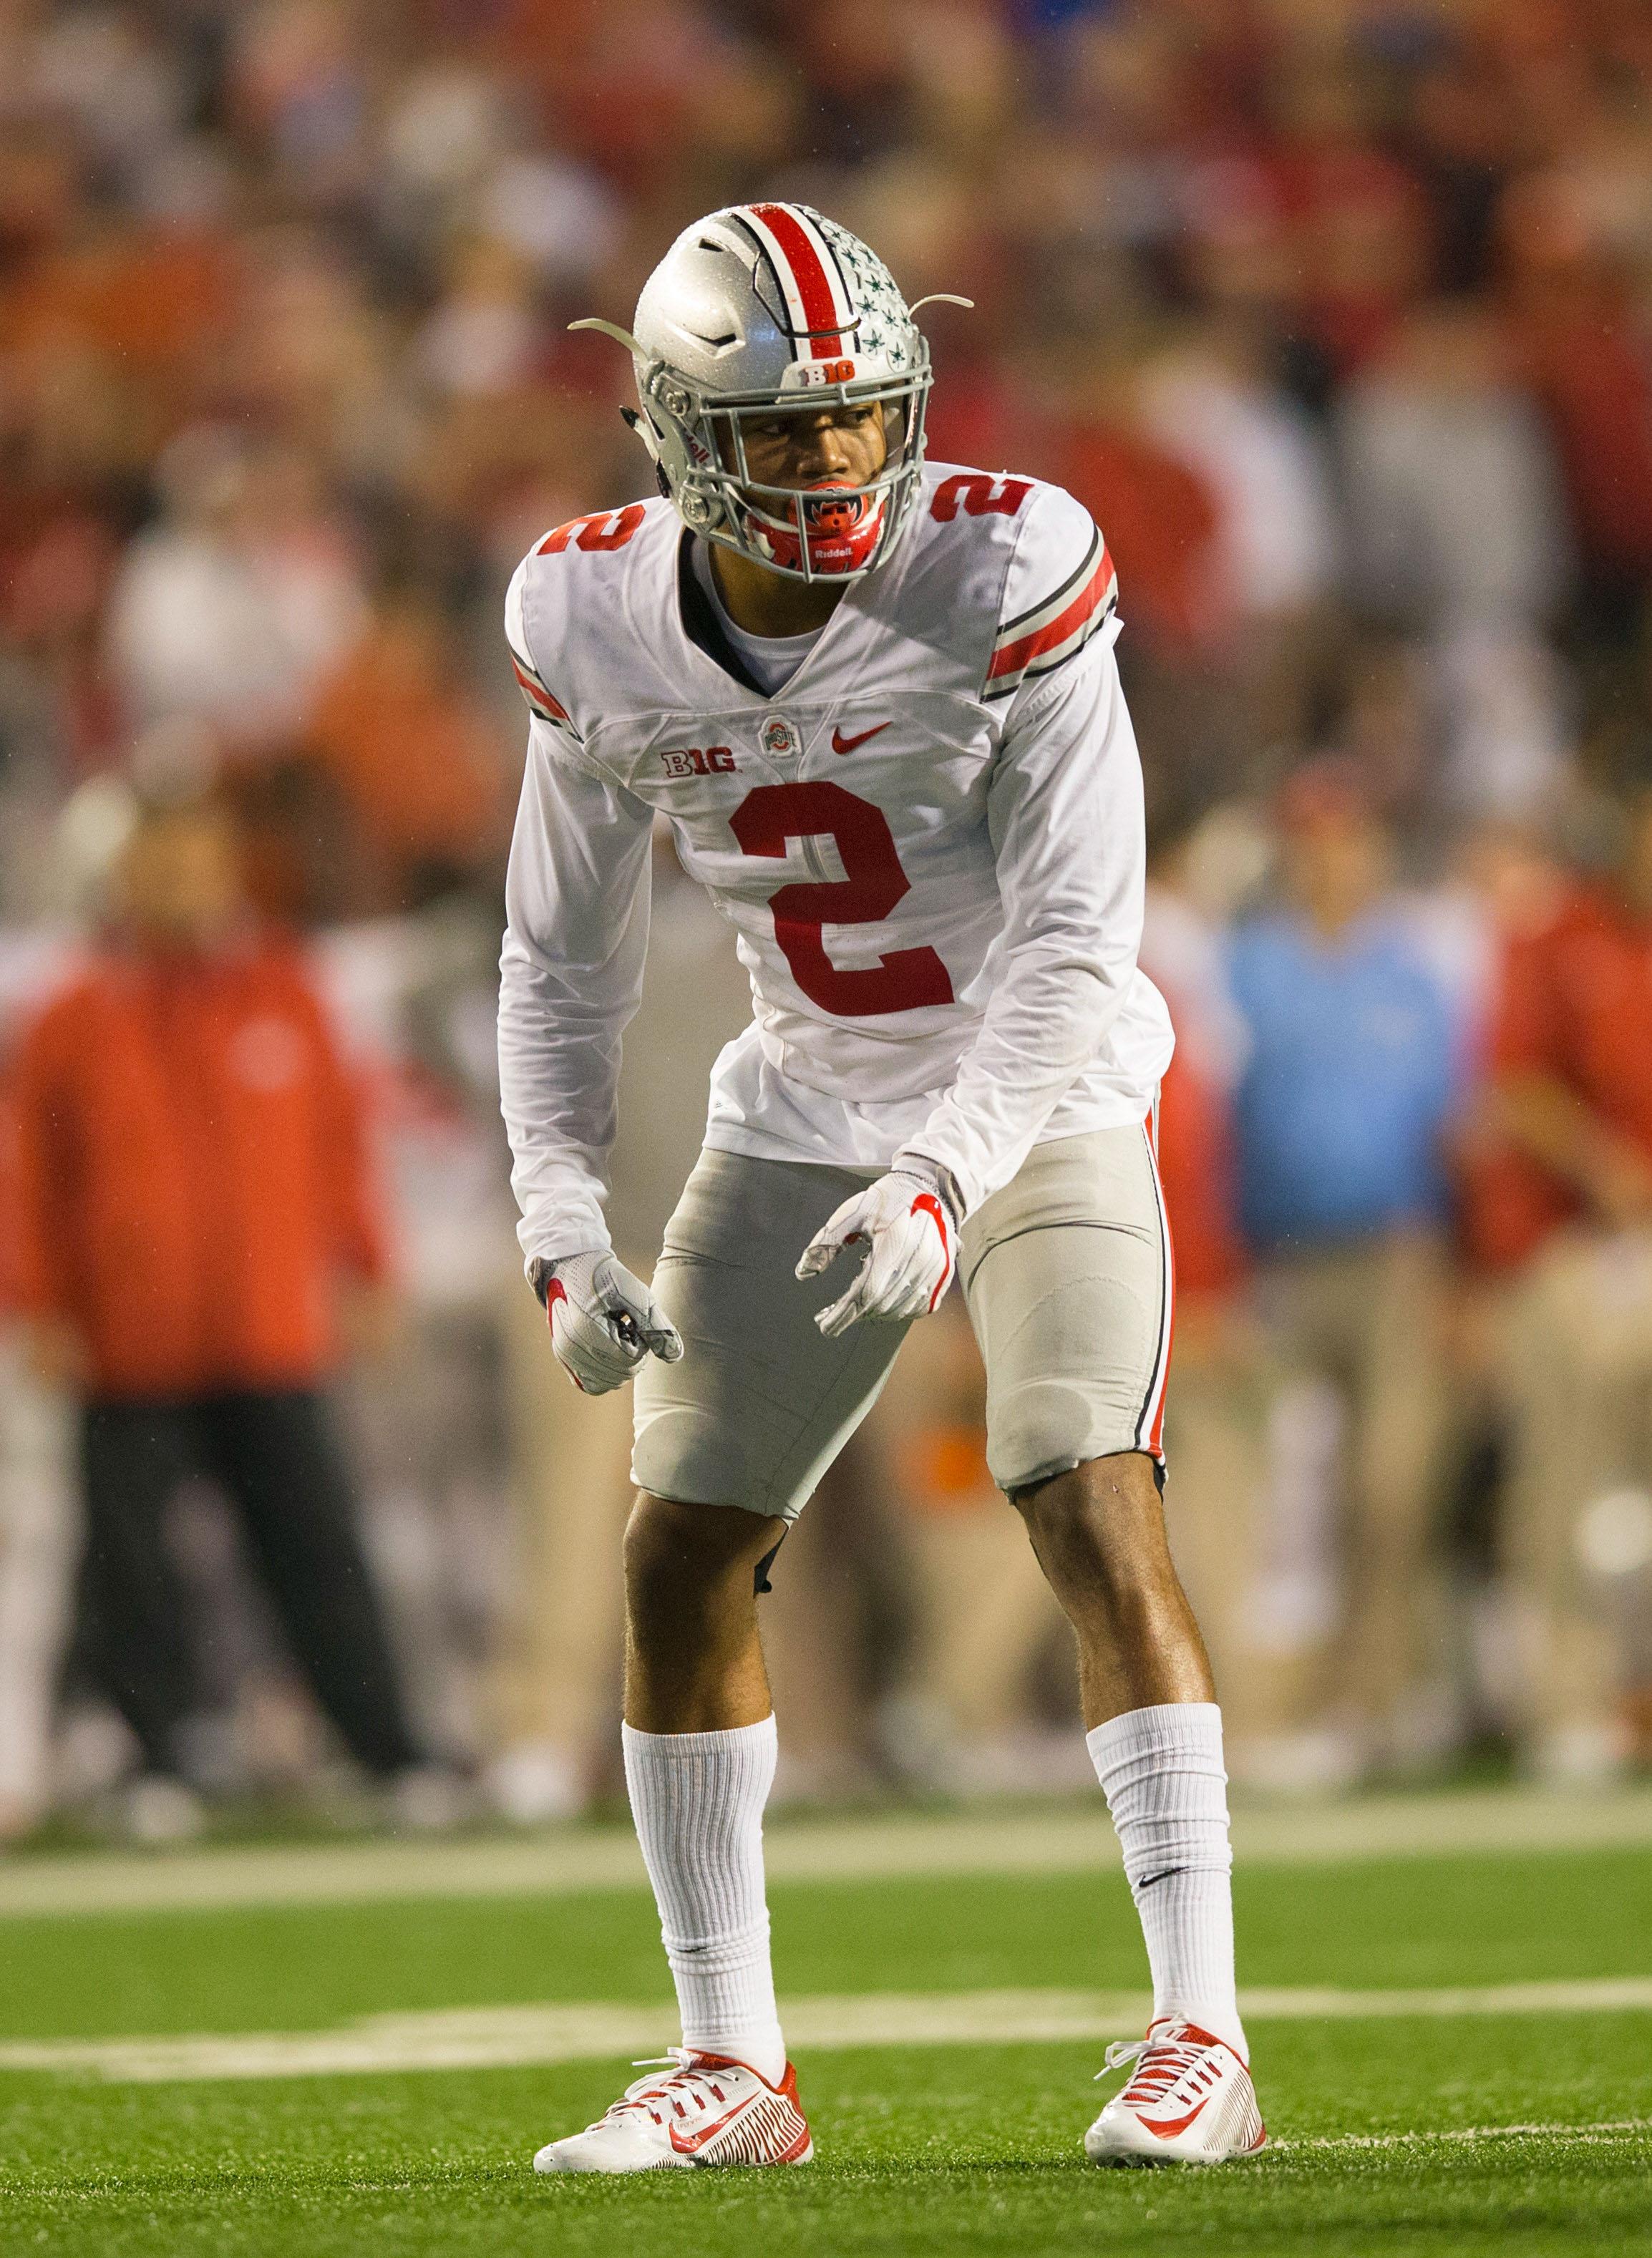 546c280239a 2016 NFL Draft - Pro Football Rumors